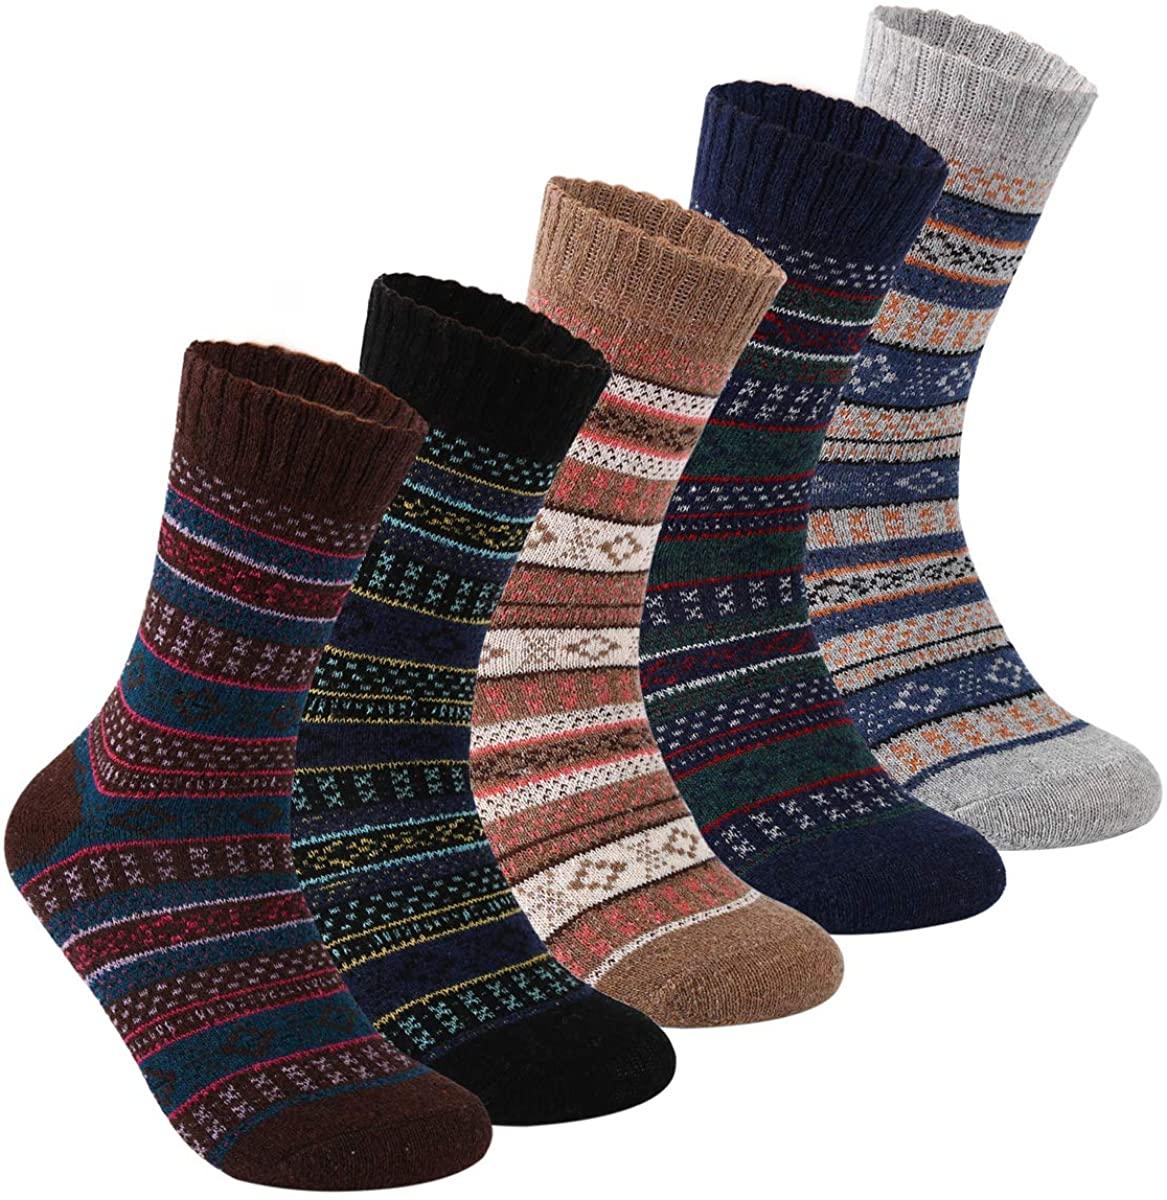 POWER YANNIK Women's Winter Soft Wool Comfort Vintage Cozy Crew Socks 5 Pack